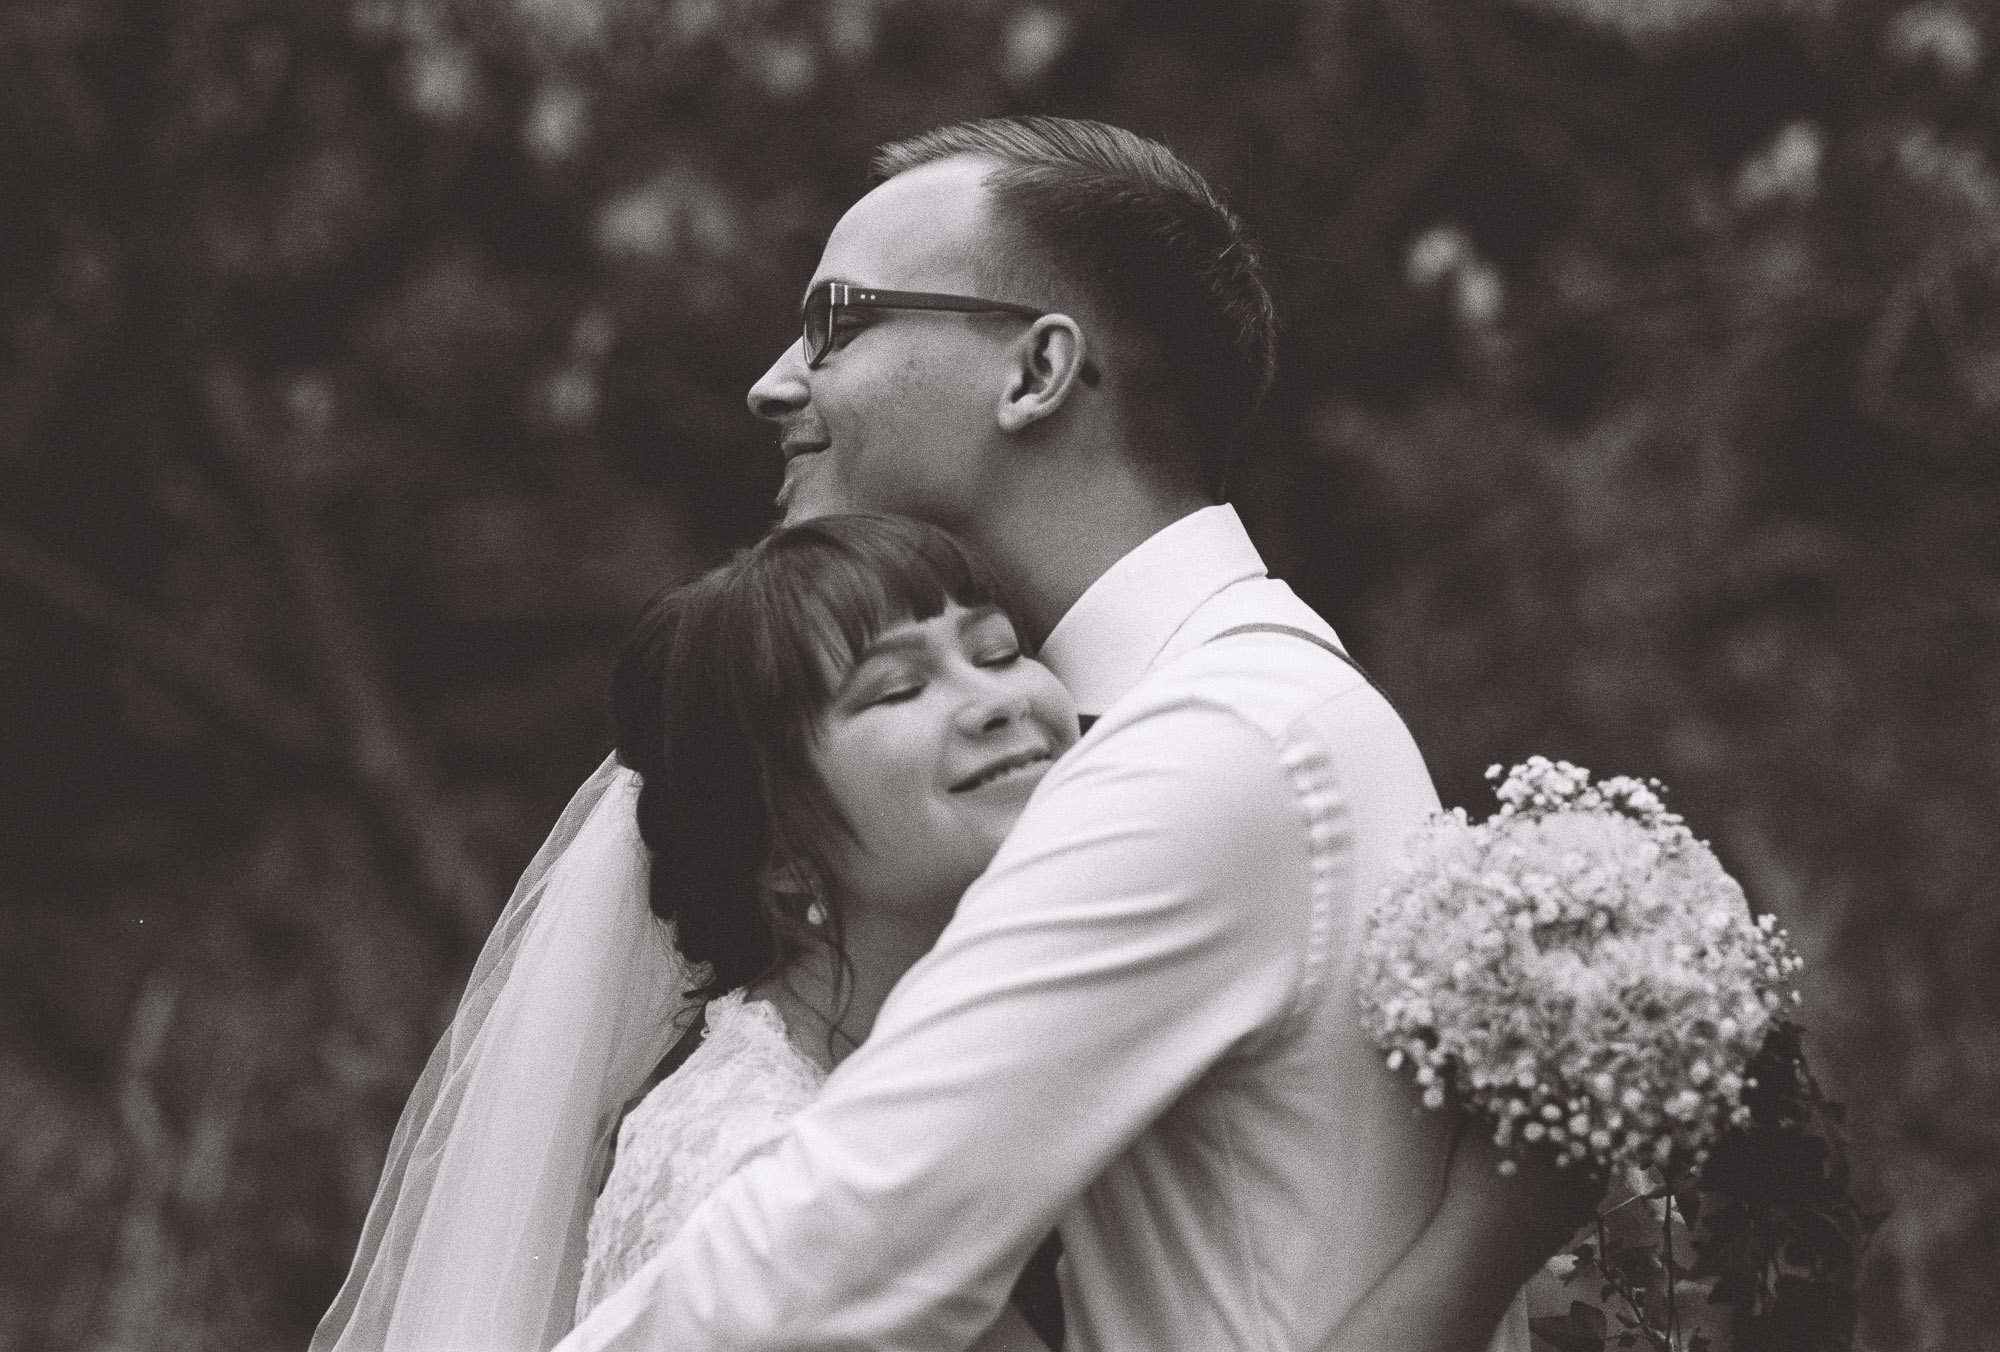 jere-satamo-analog-film-wedding-photographer-finland-081.jpg